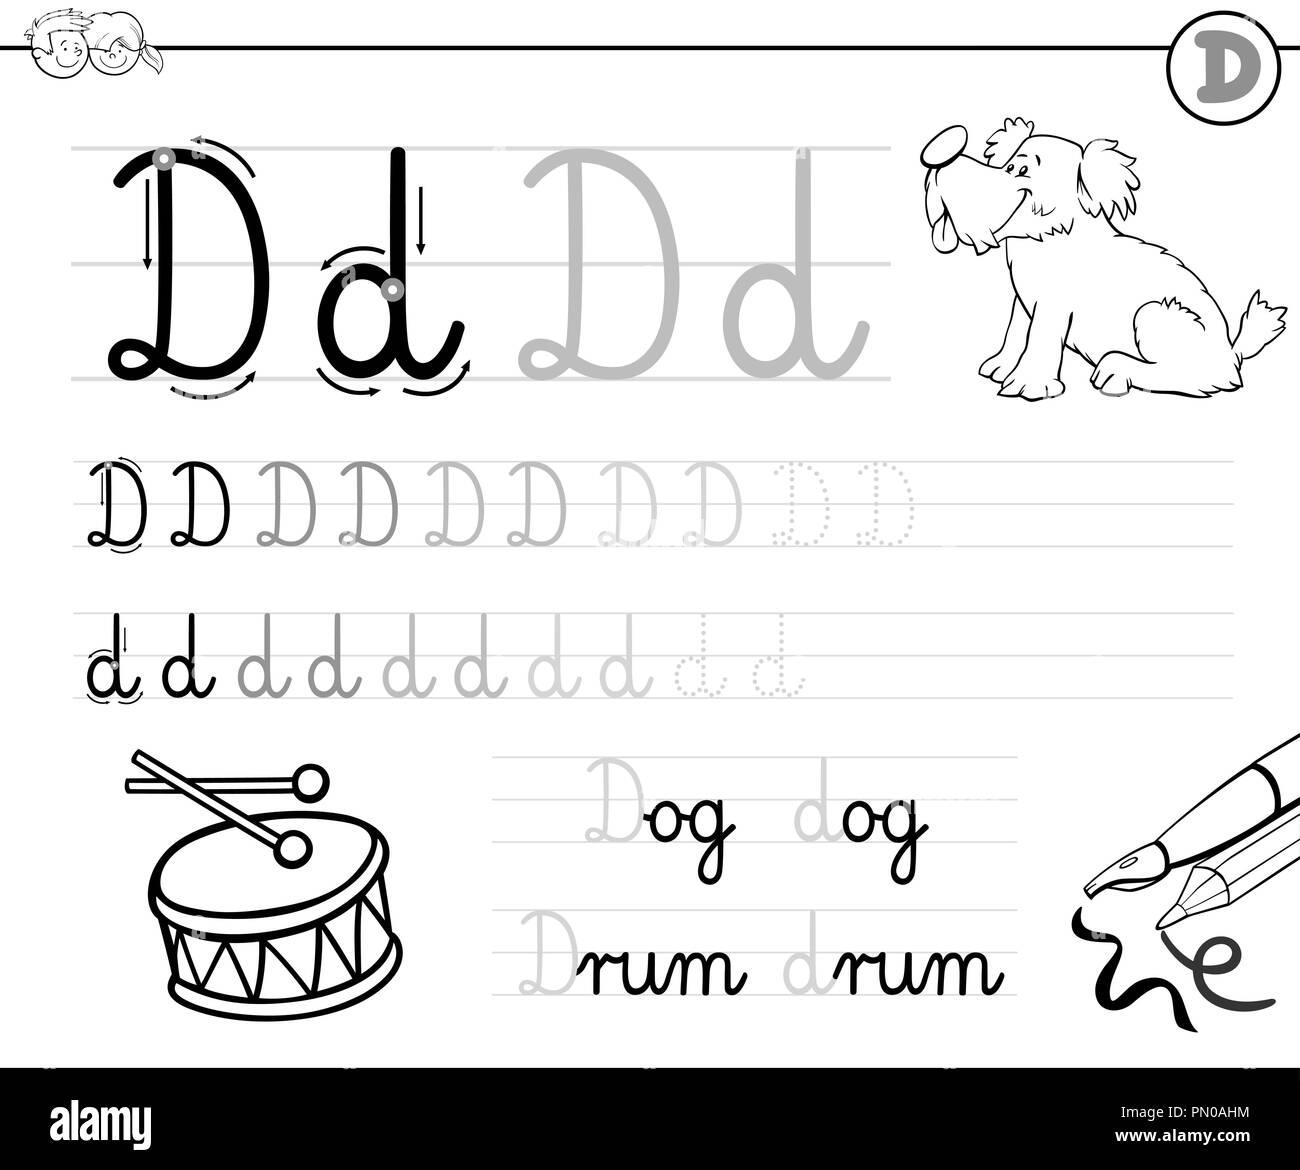 Cartoon Illustration Writing Skills Practice Stock Photos & Cartoon ...